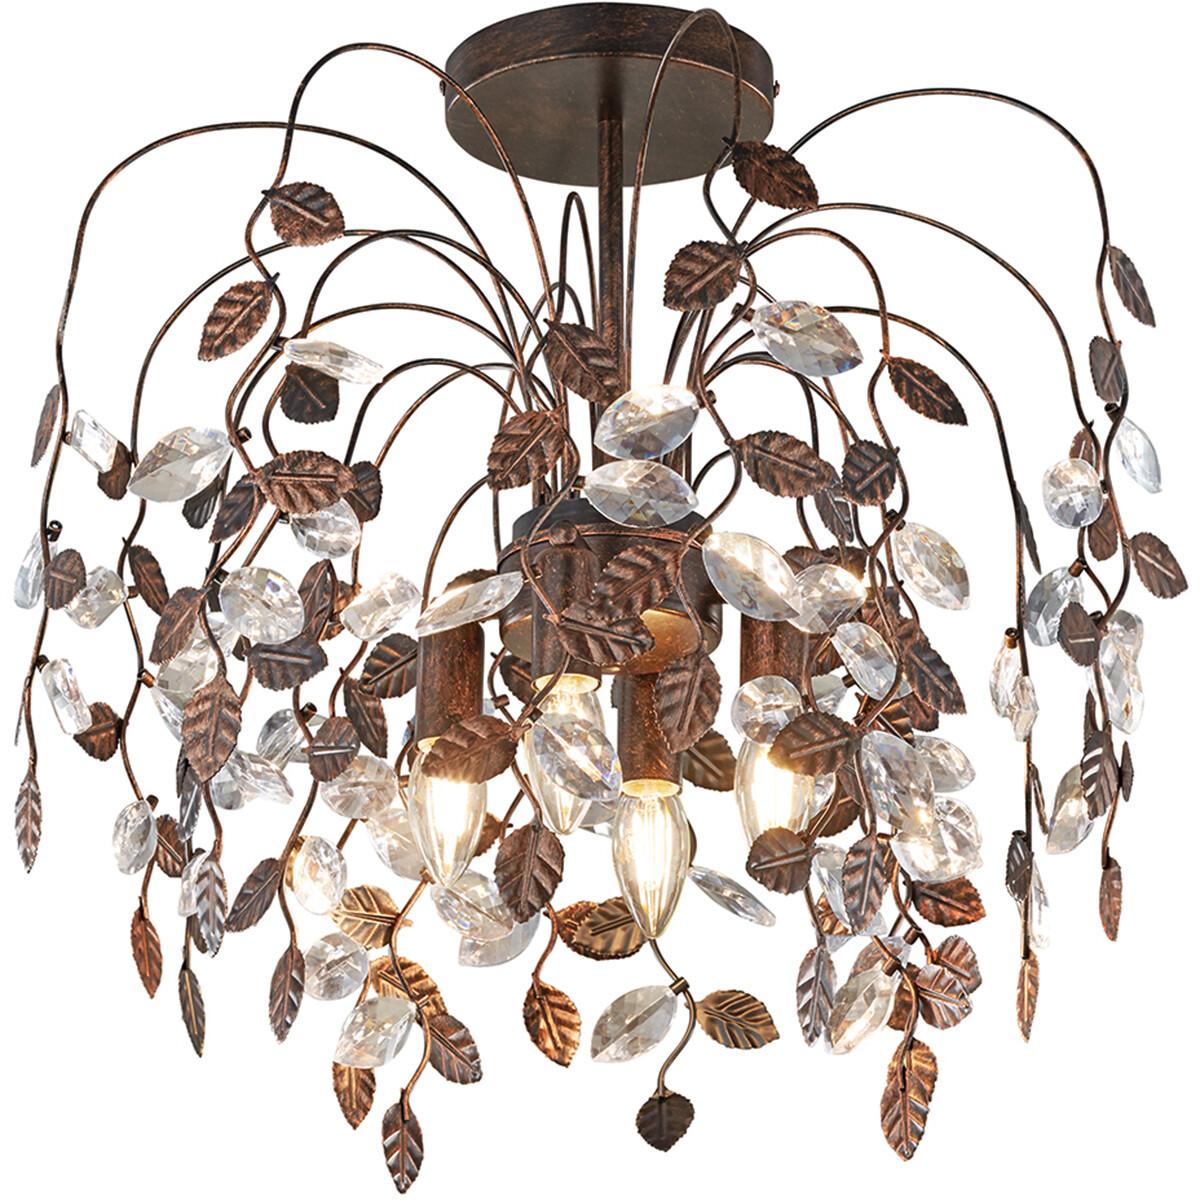 LED Plafondlamp - Plafondverlichting - Trion Nipola - E14 Fitting - Rond - Roestkleur - Aluminium